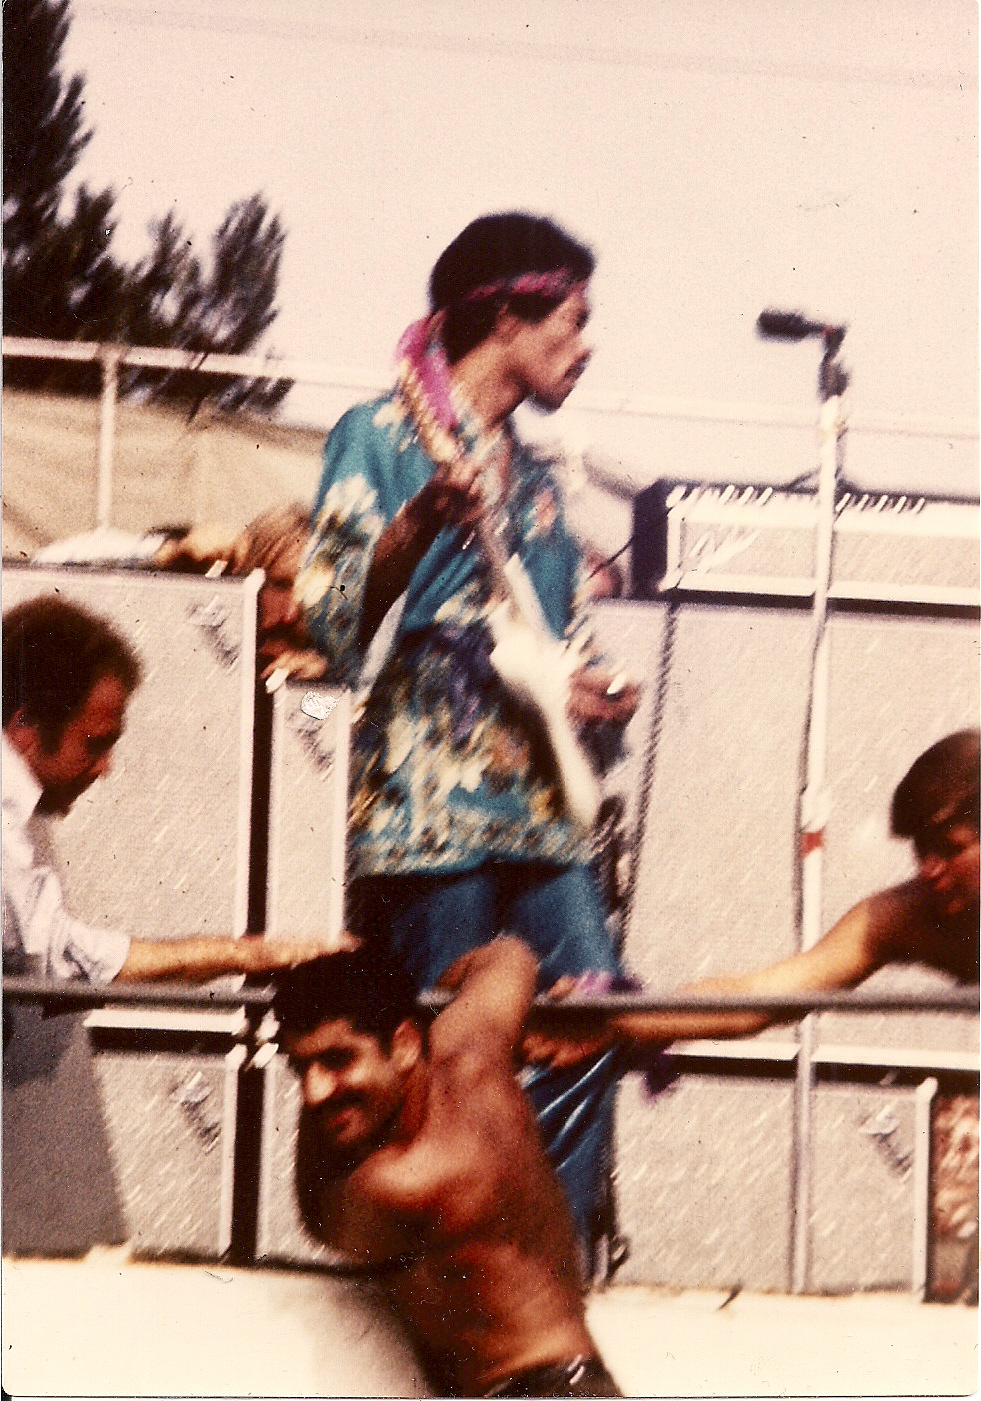 Devonshire Downs (Newport '69) : 22 juin 1969  Aaeef93b3e0a53bd1b2ab264541e5b12